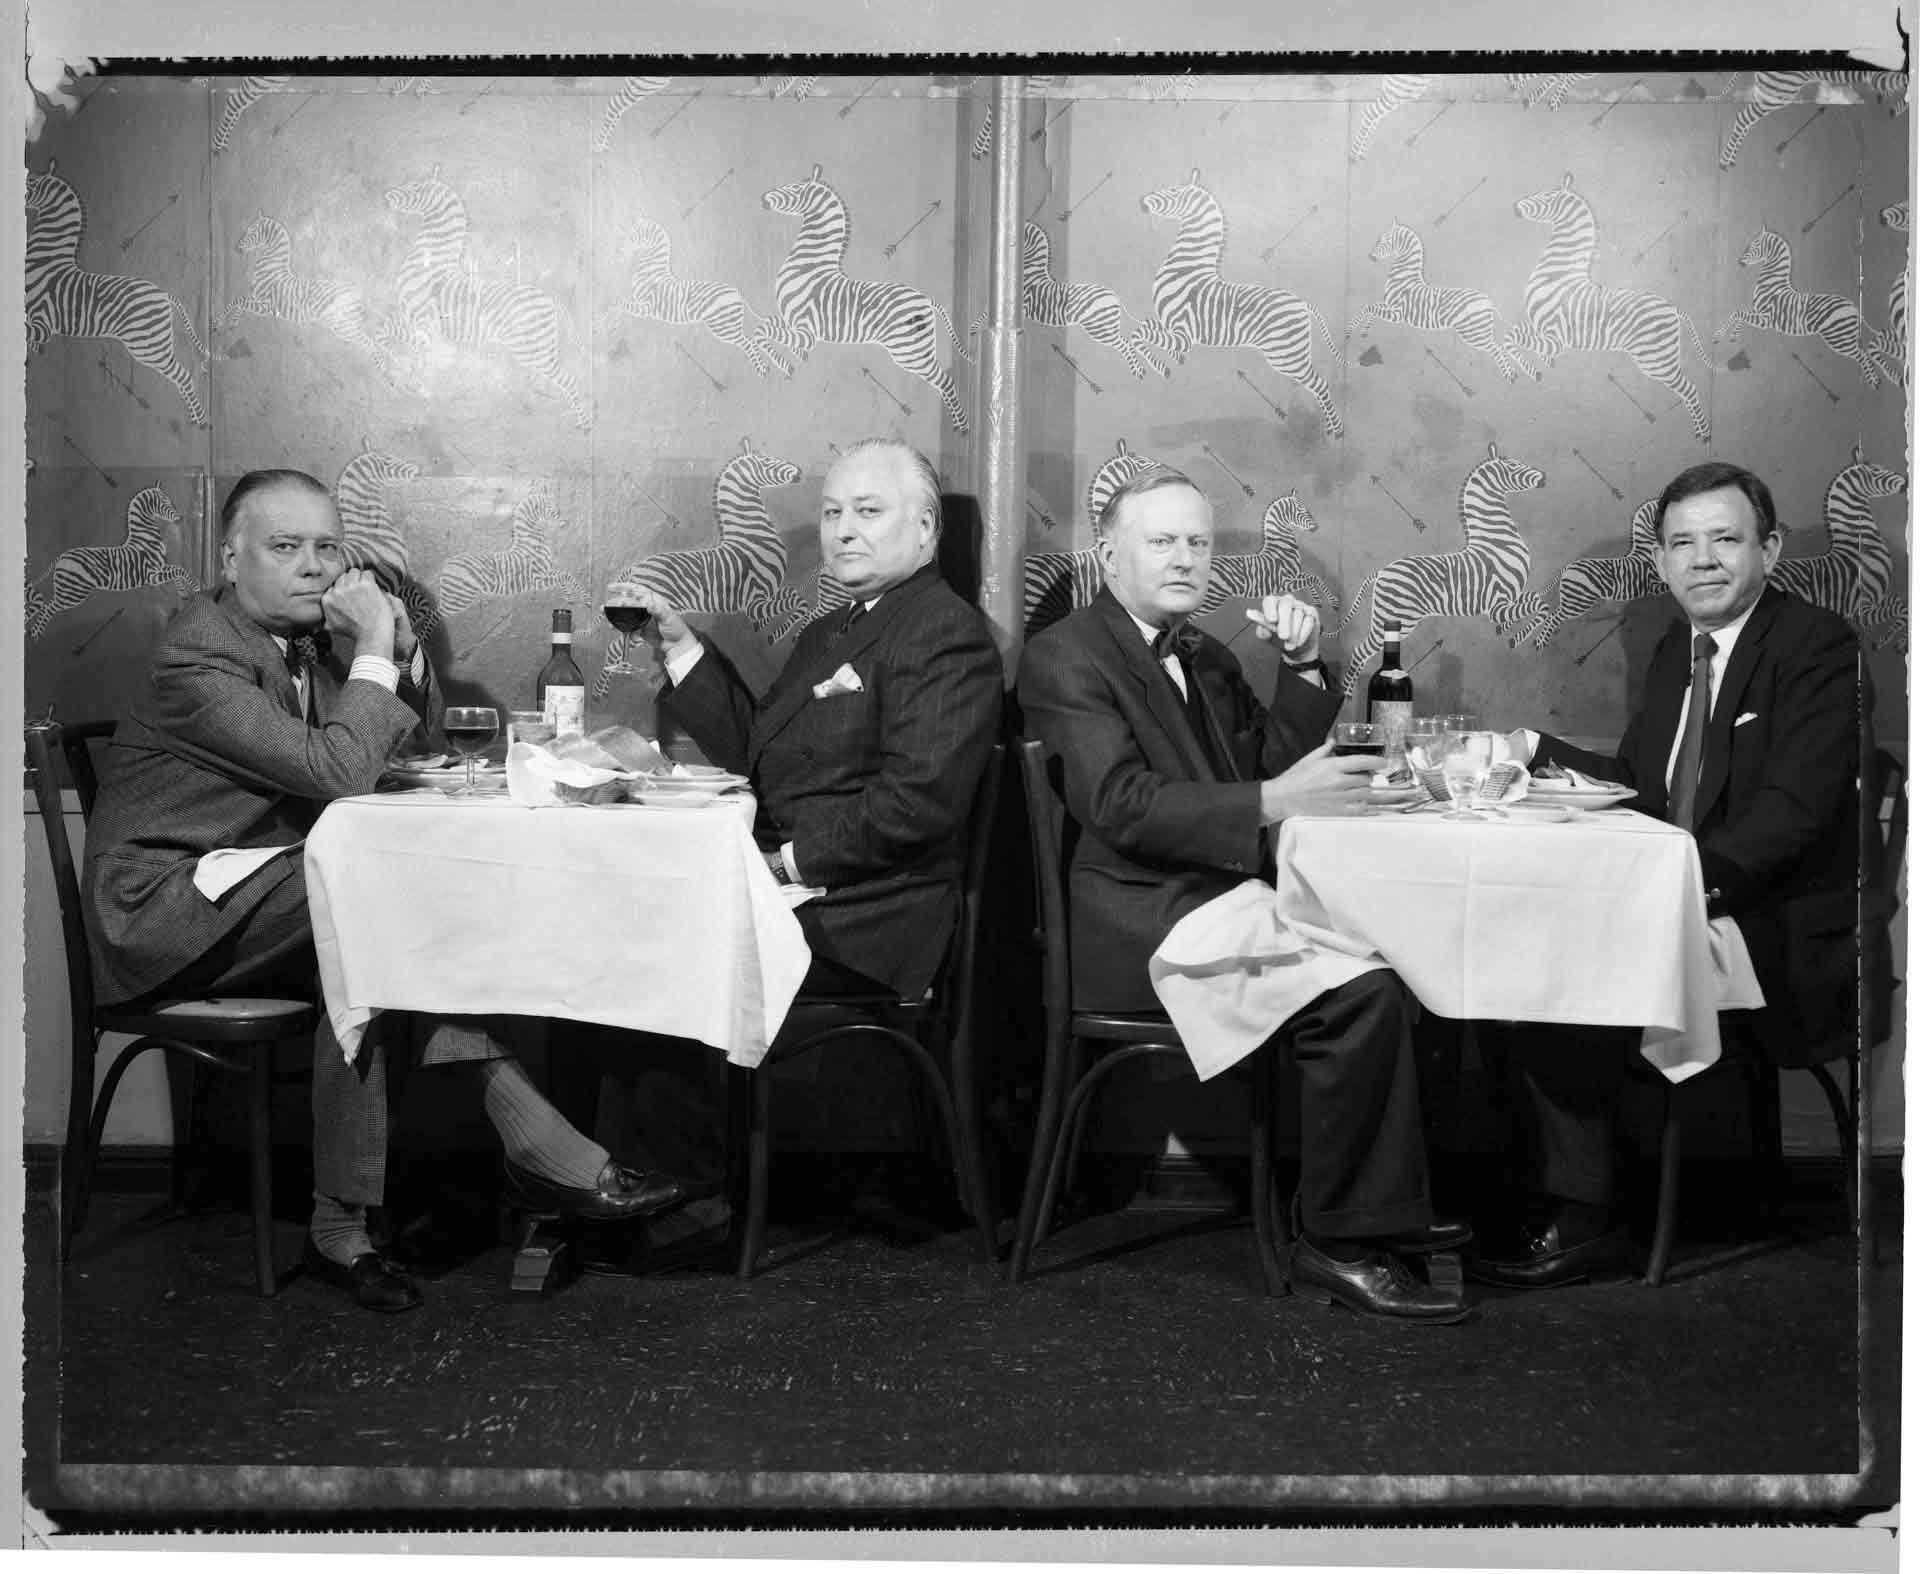 ©©Ken Shung - Four Men at Geno's. Black and white-men at dining tables, looking at the camera, restaurant, NYC